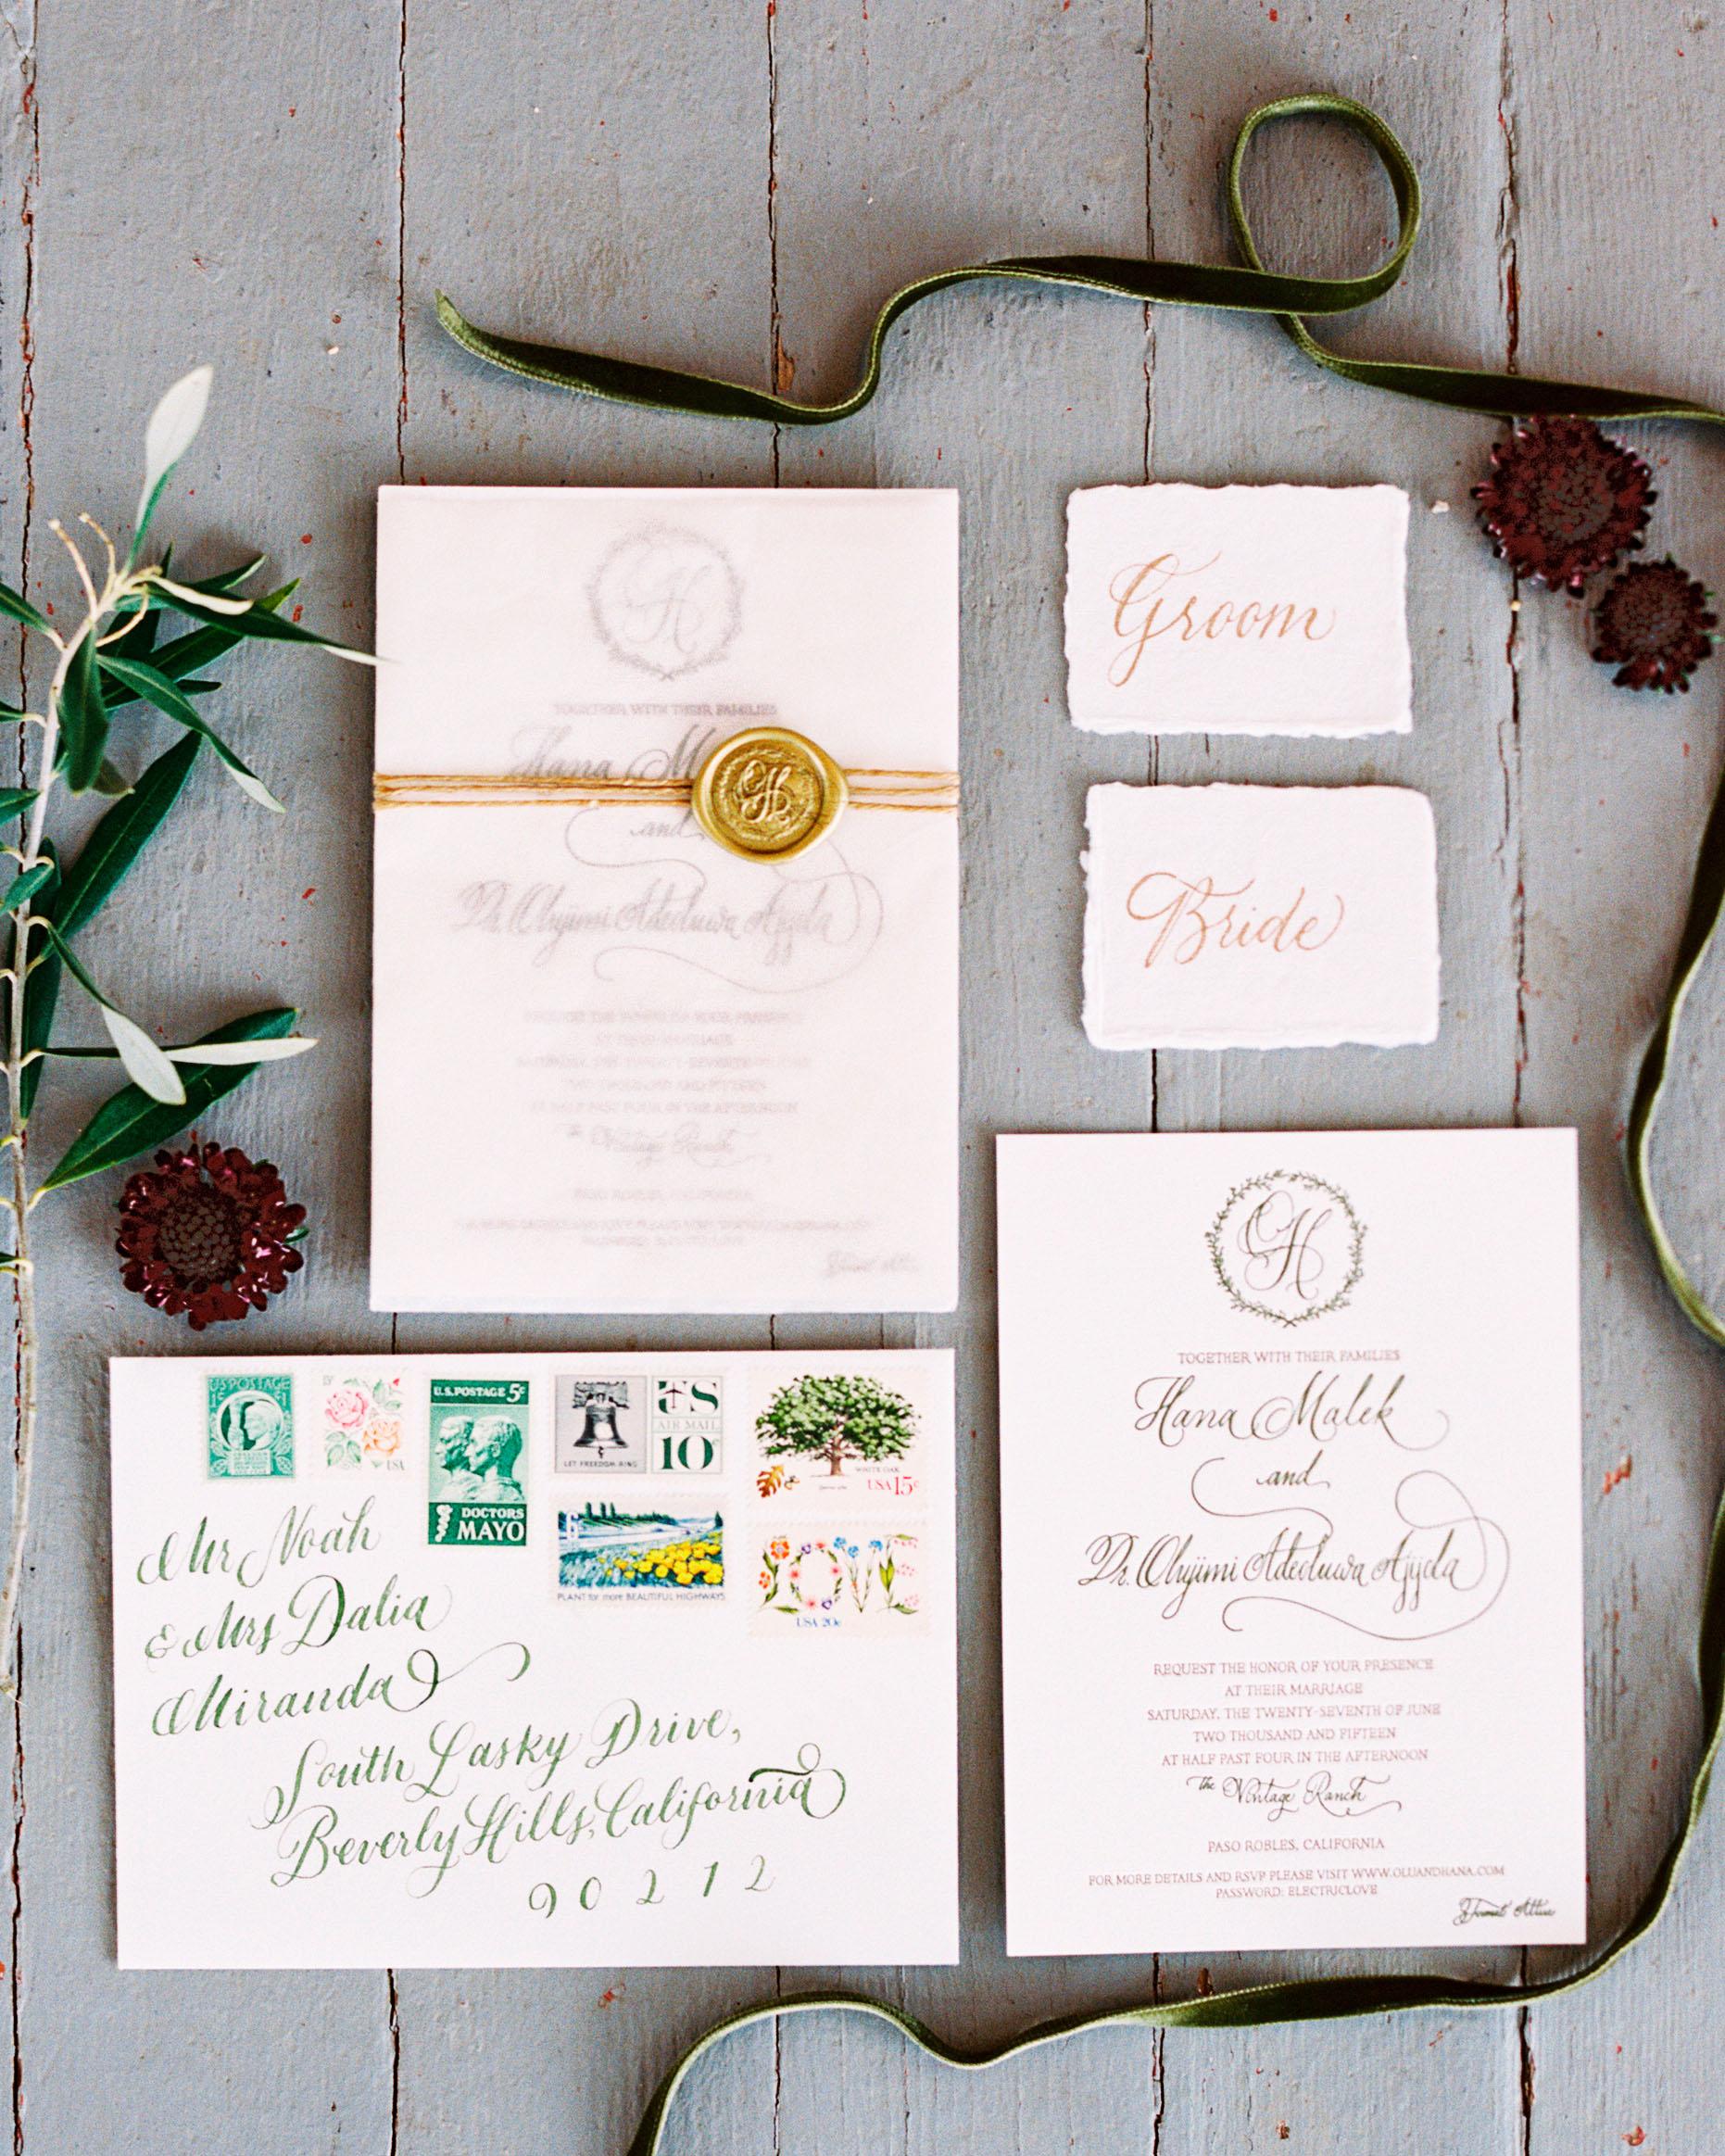 hana olu wedding california stationery